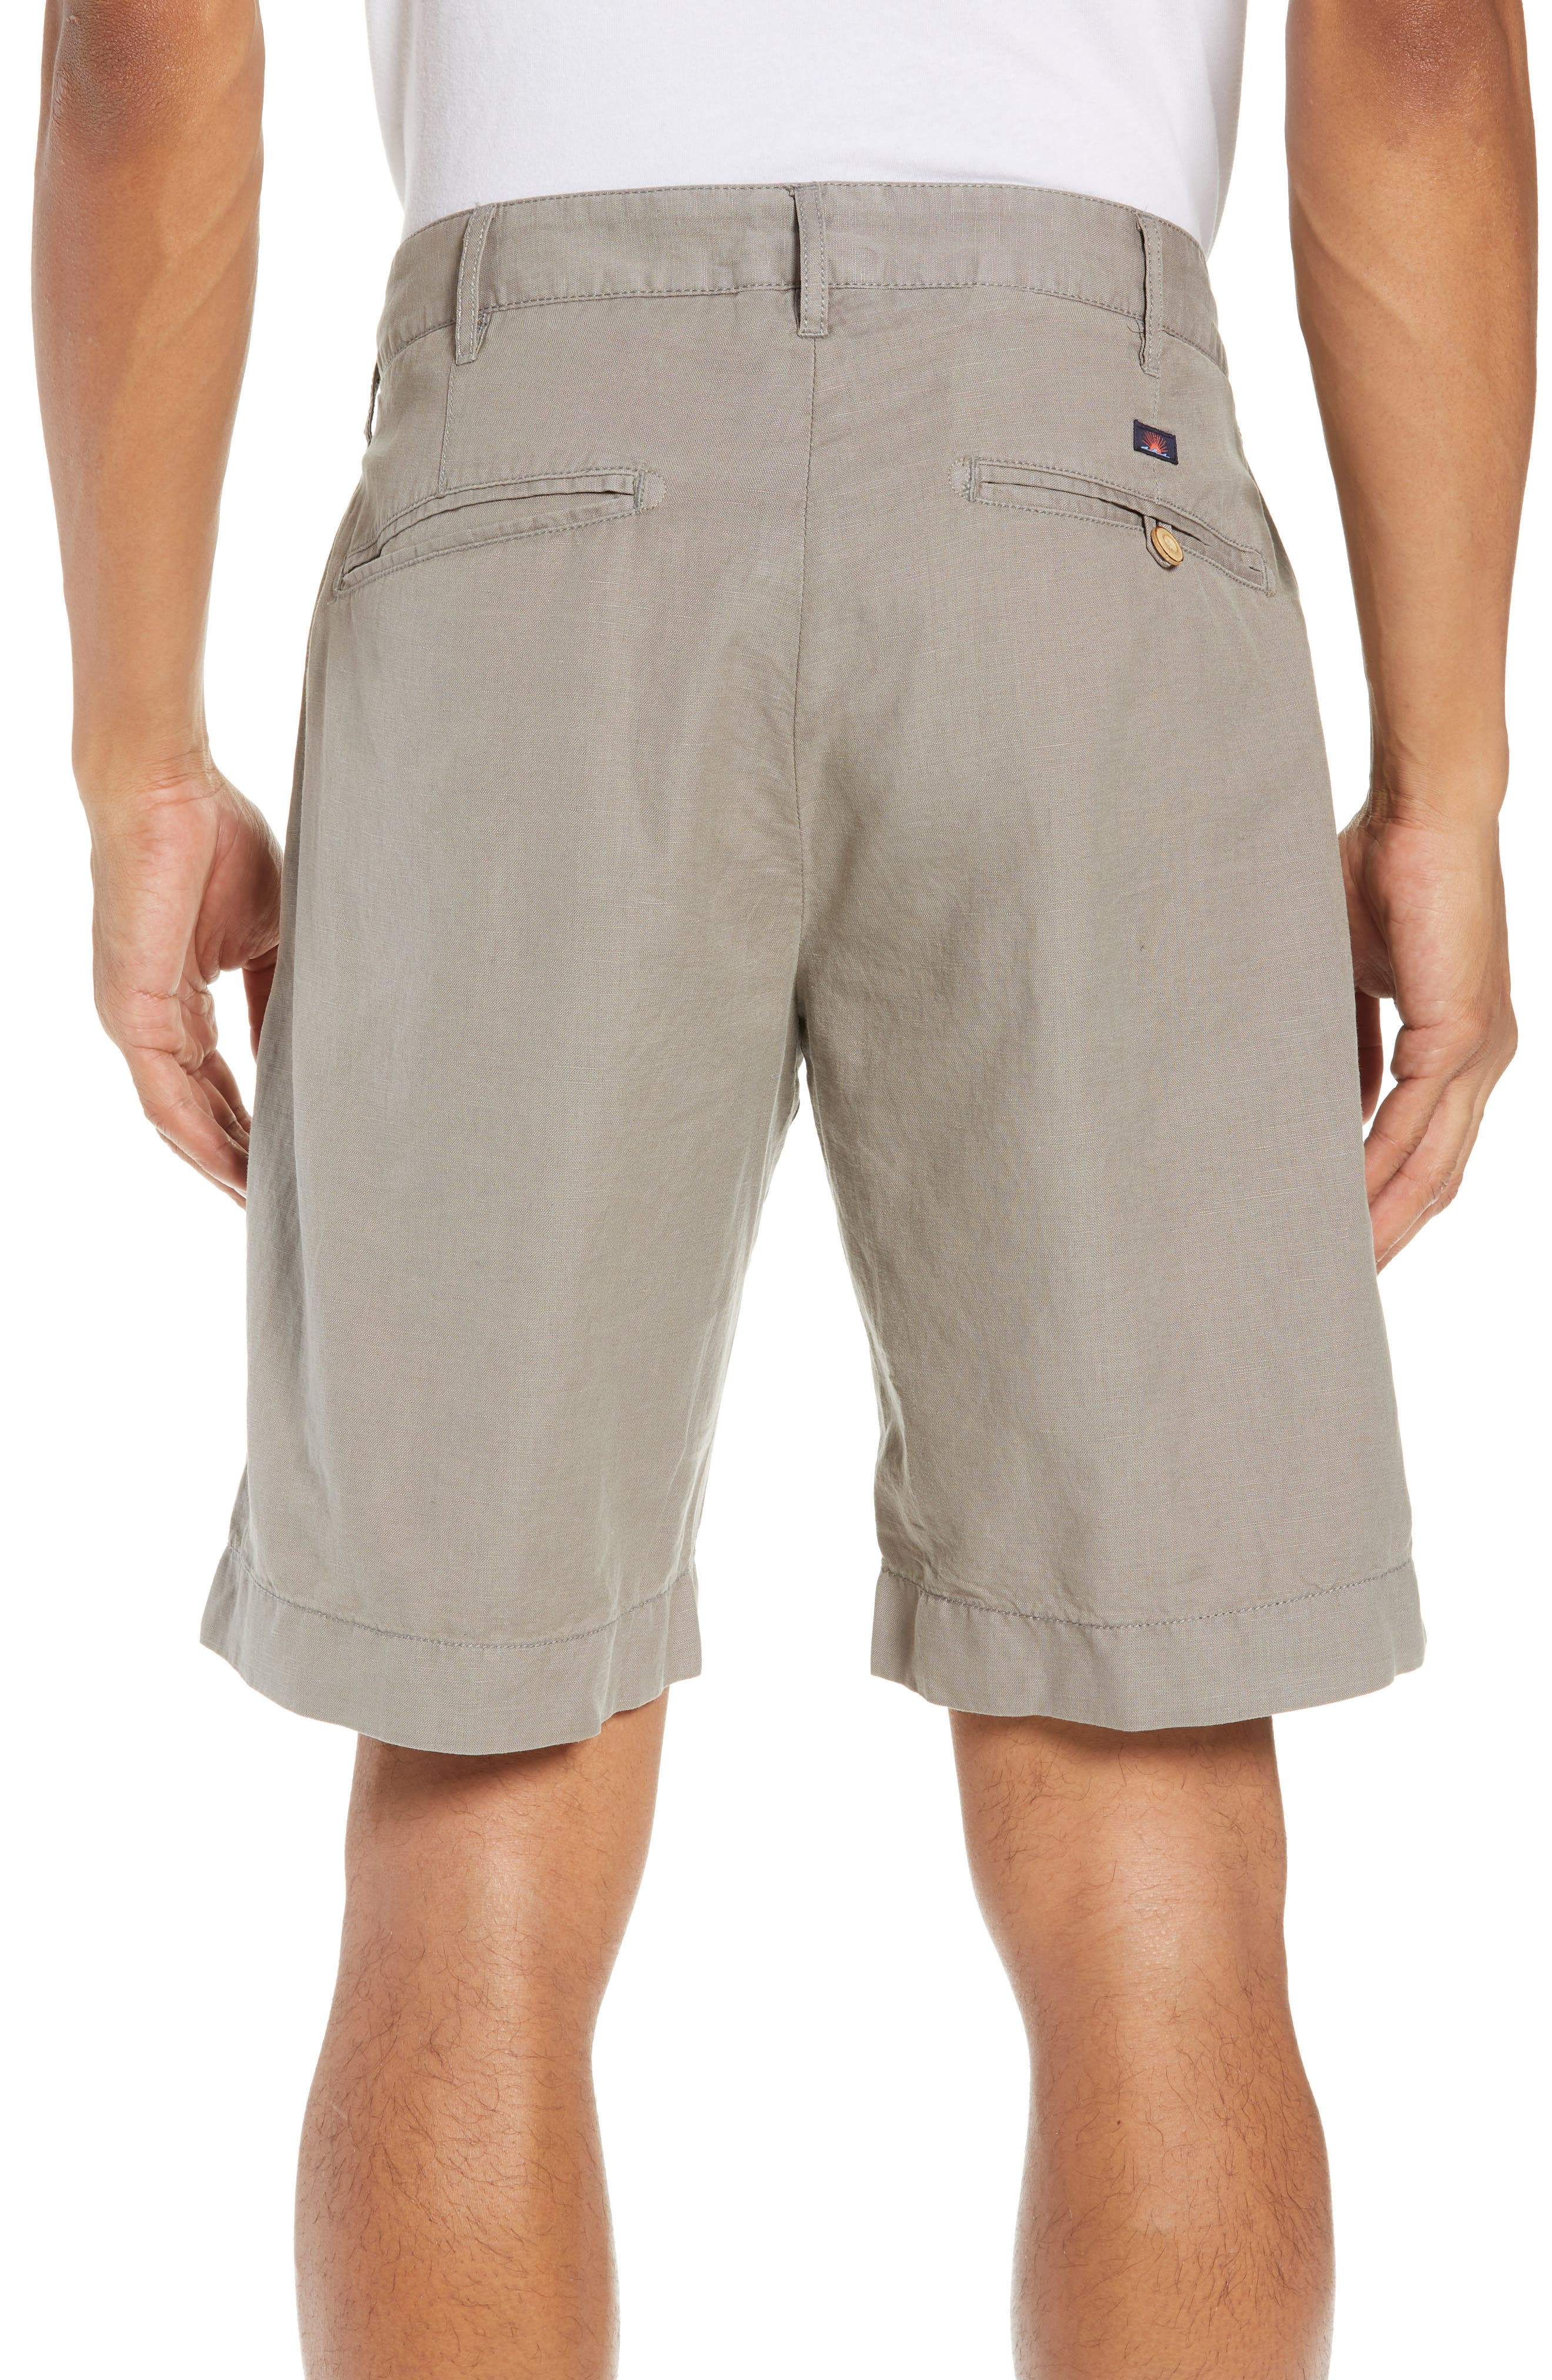 Malibu Shorts,                             Alternate thumbnail 2, color,                             GREY